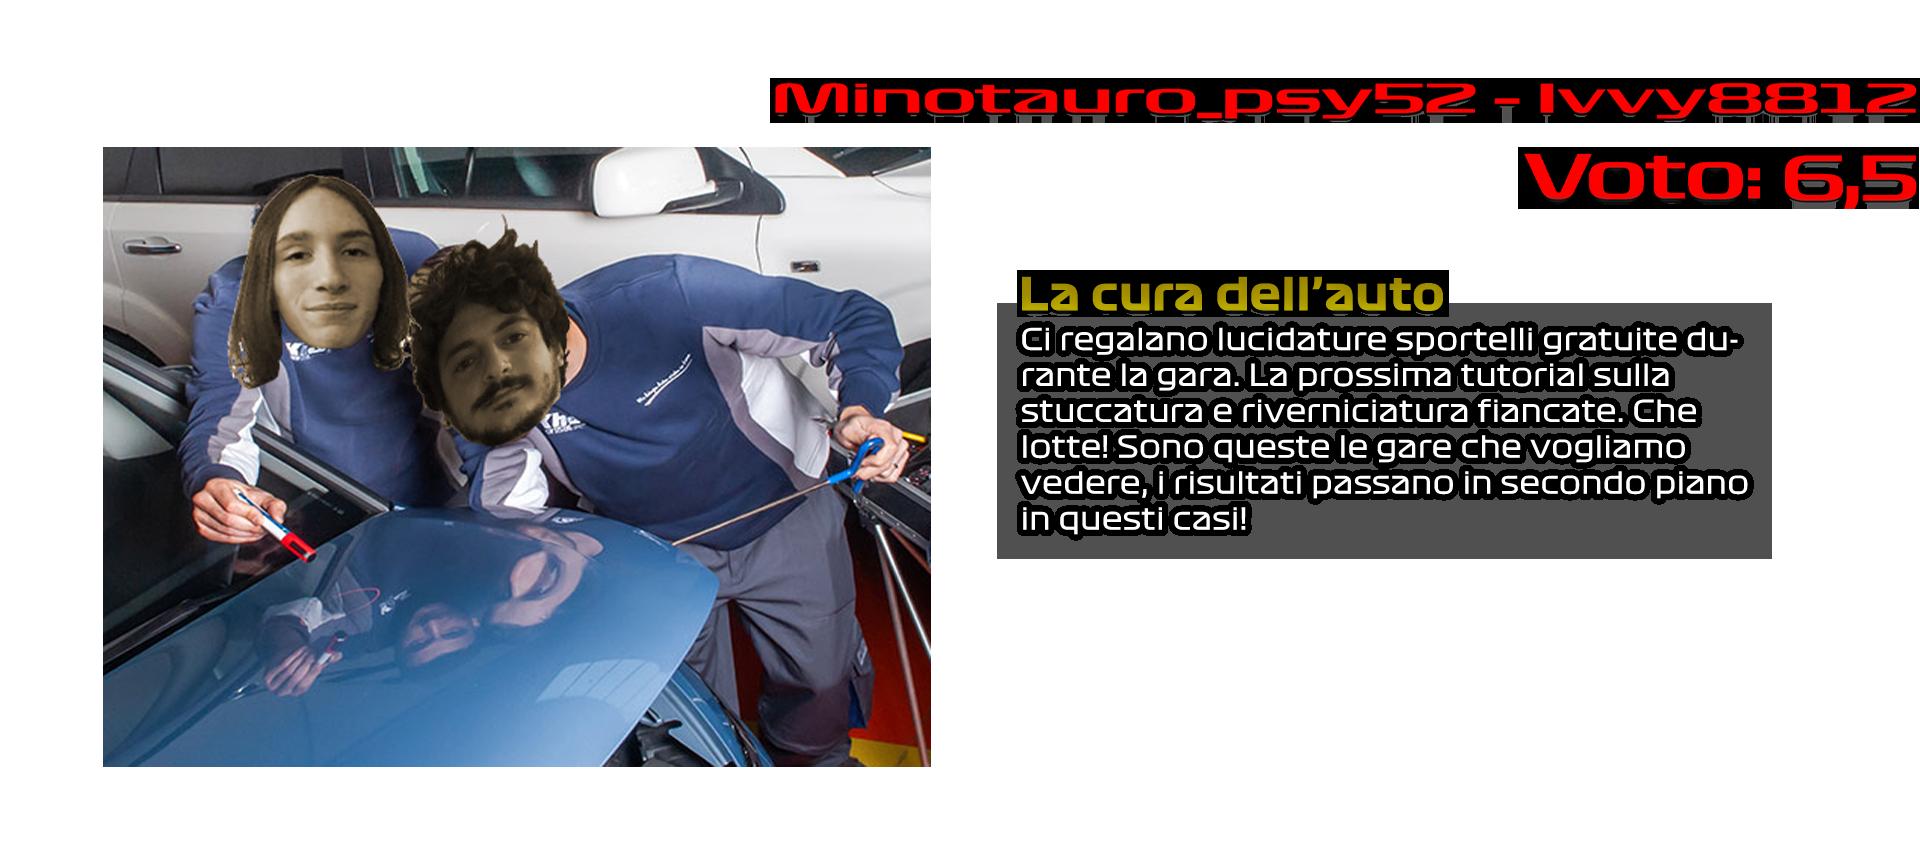 Garetta stasera random GT6-7-minotauro-png